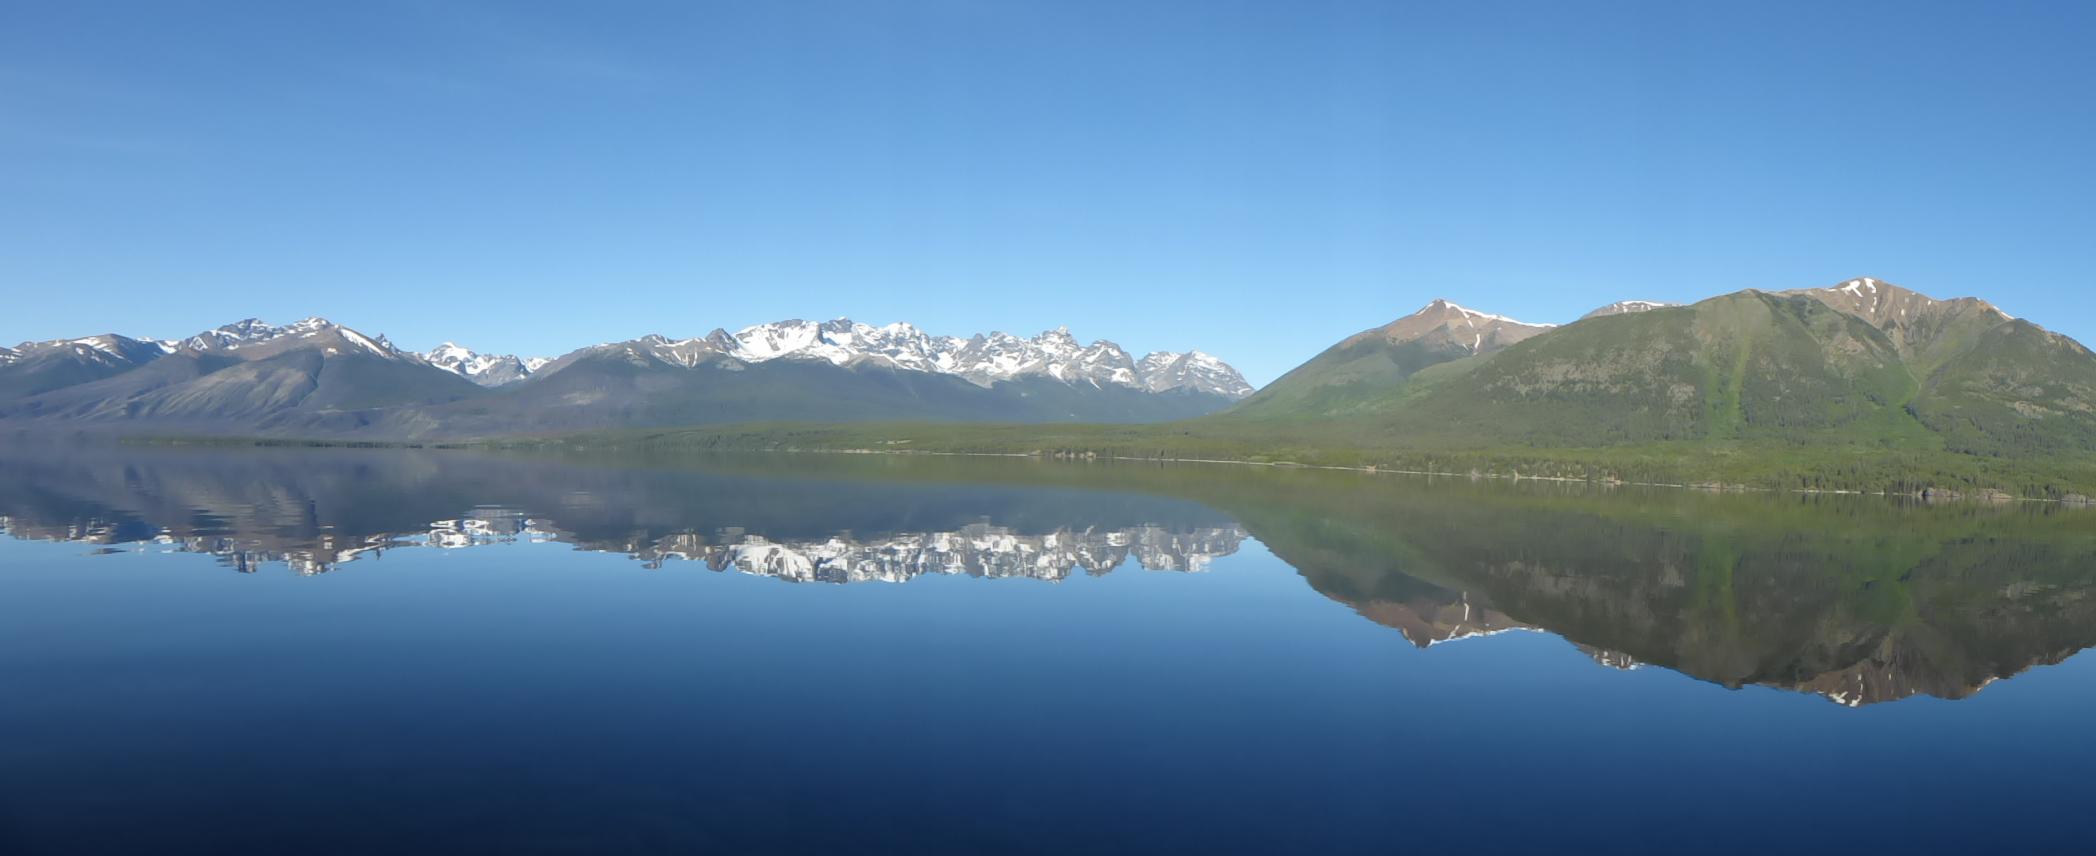 Perfect lake, Chilko Lake